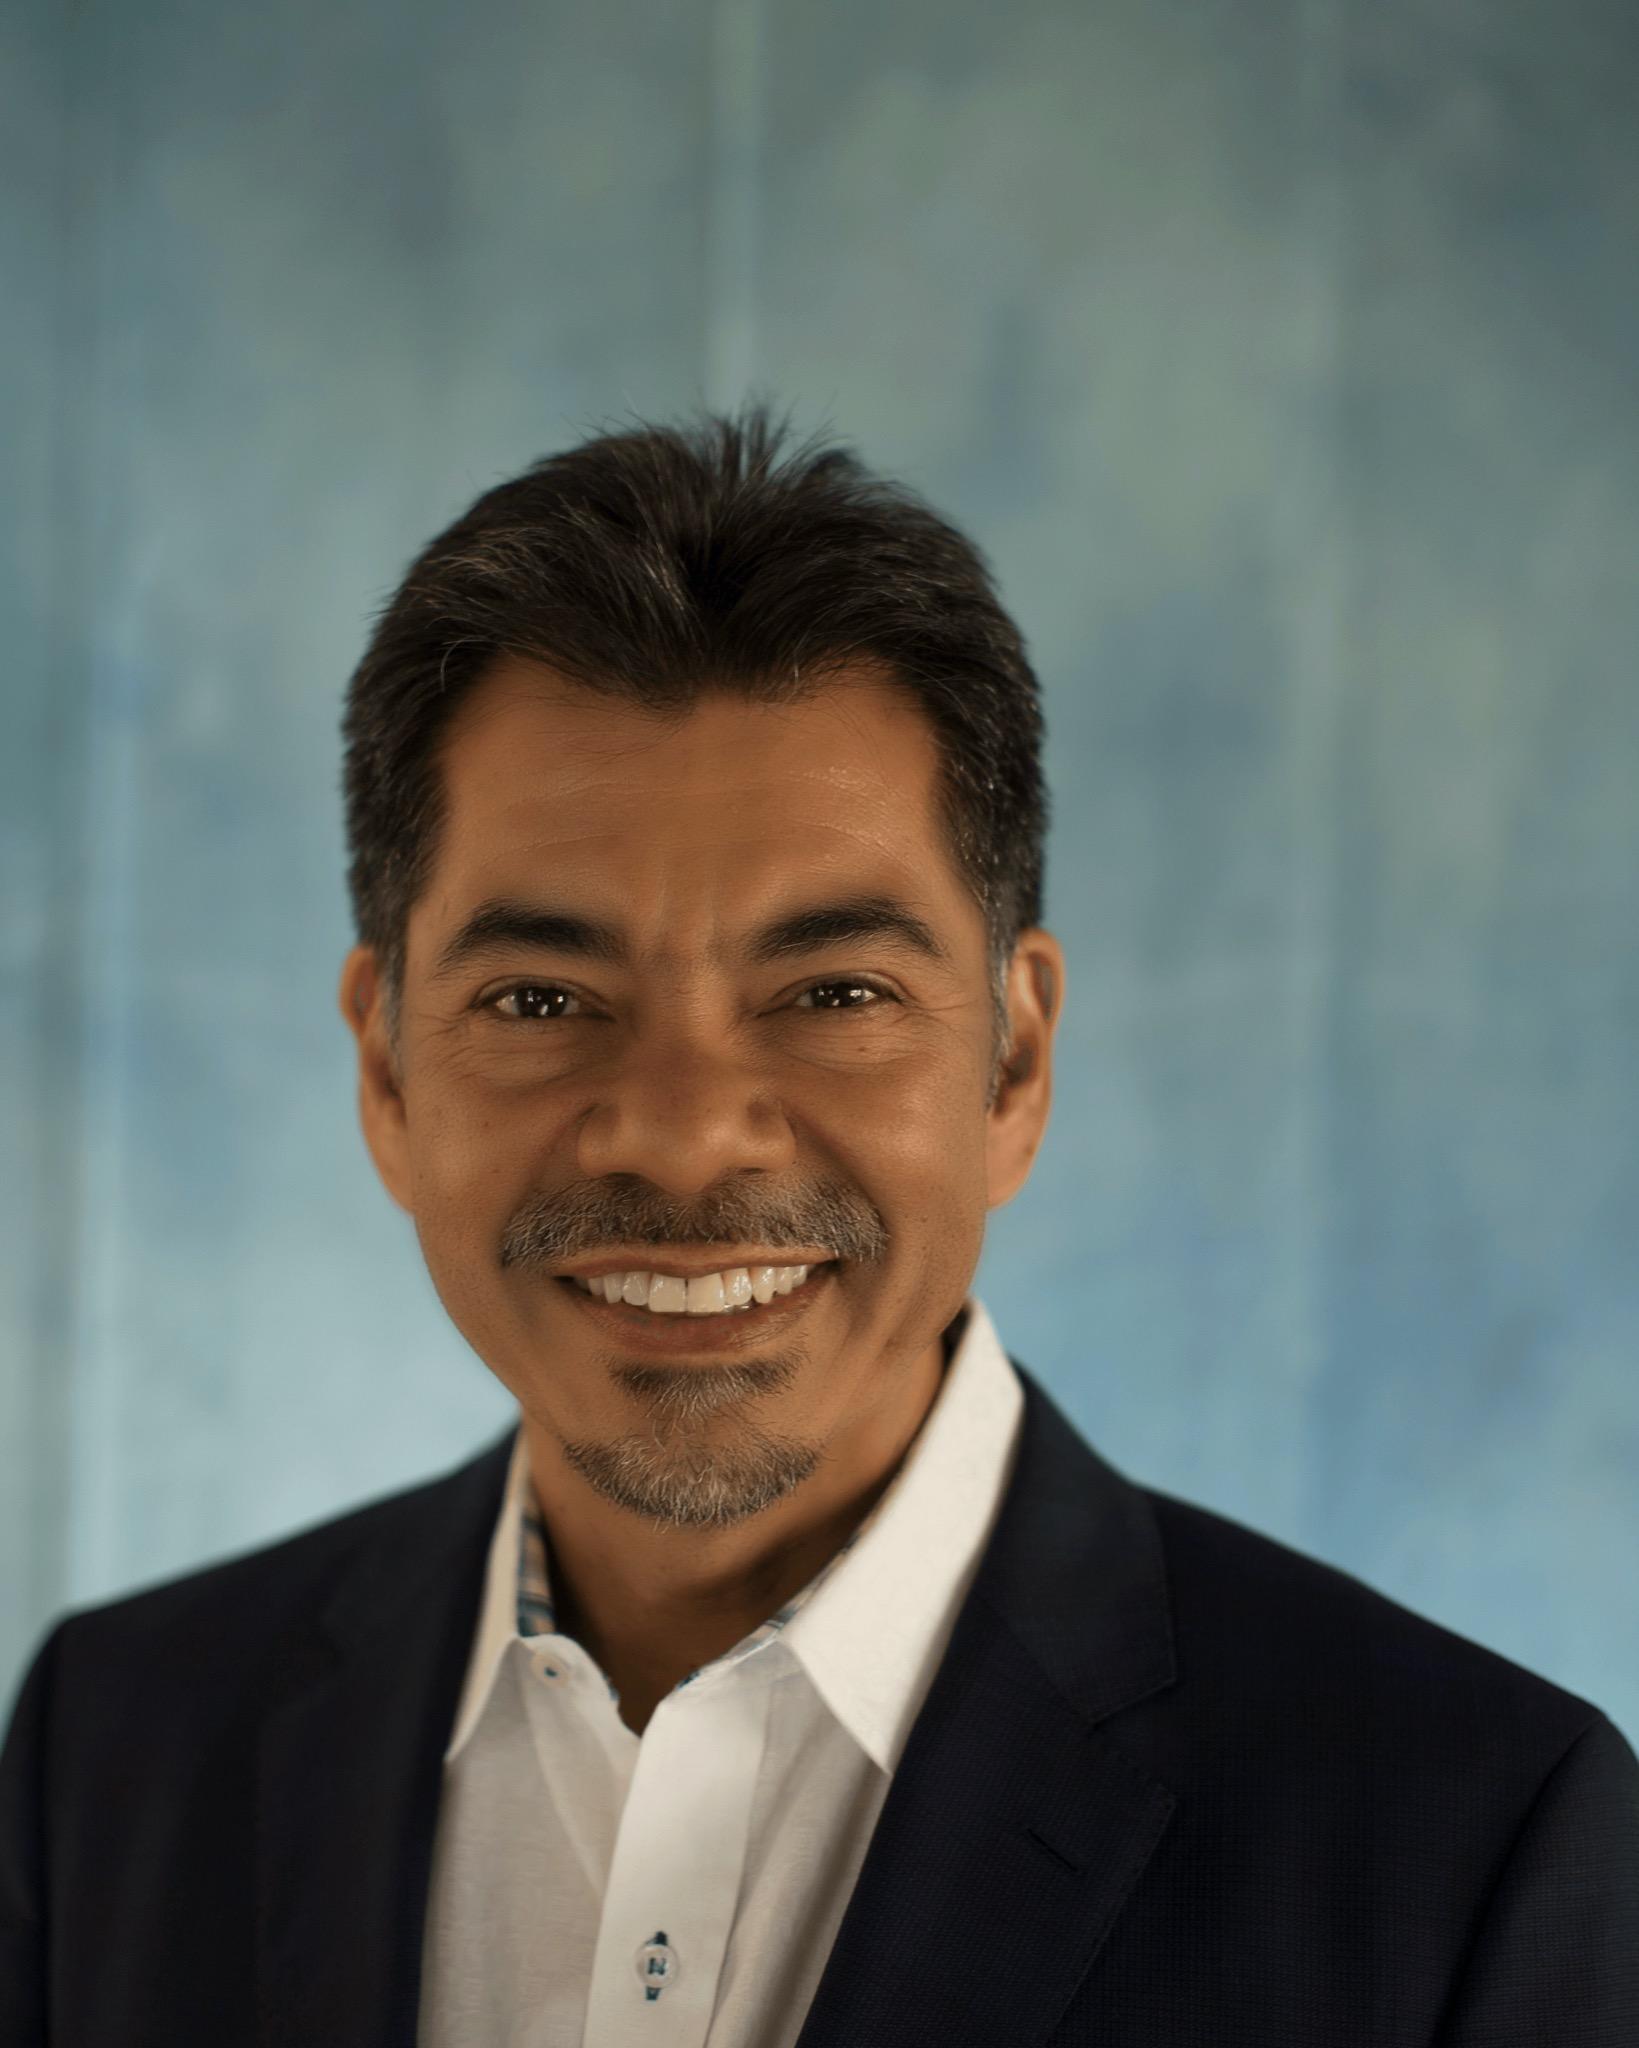 Daniel Mujica